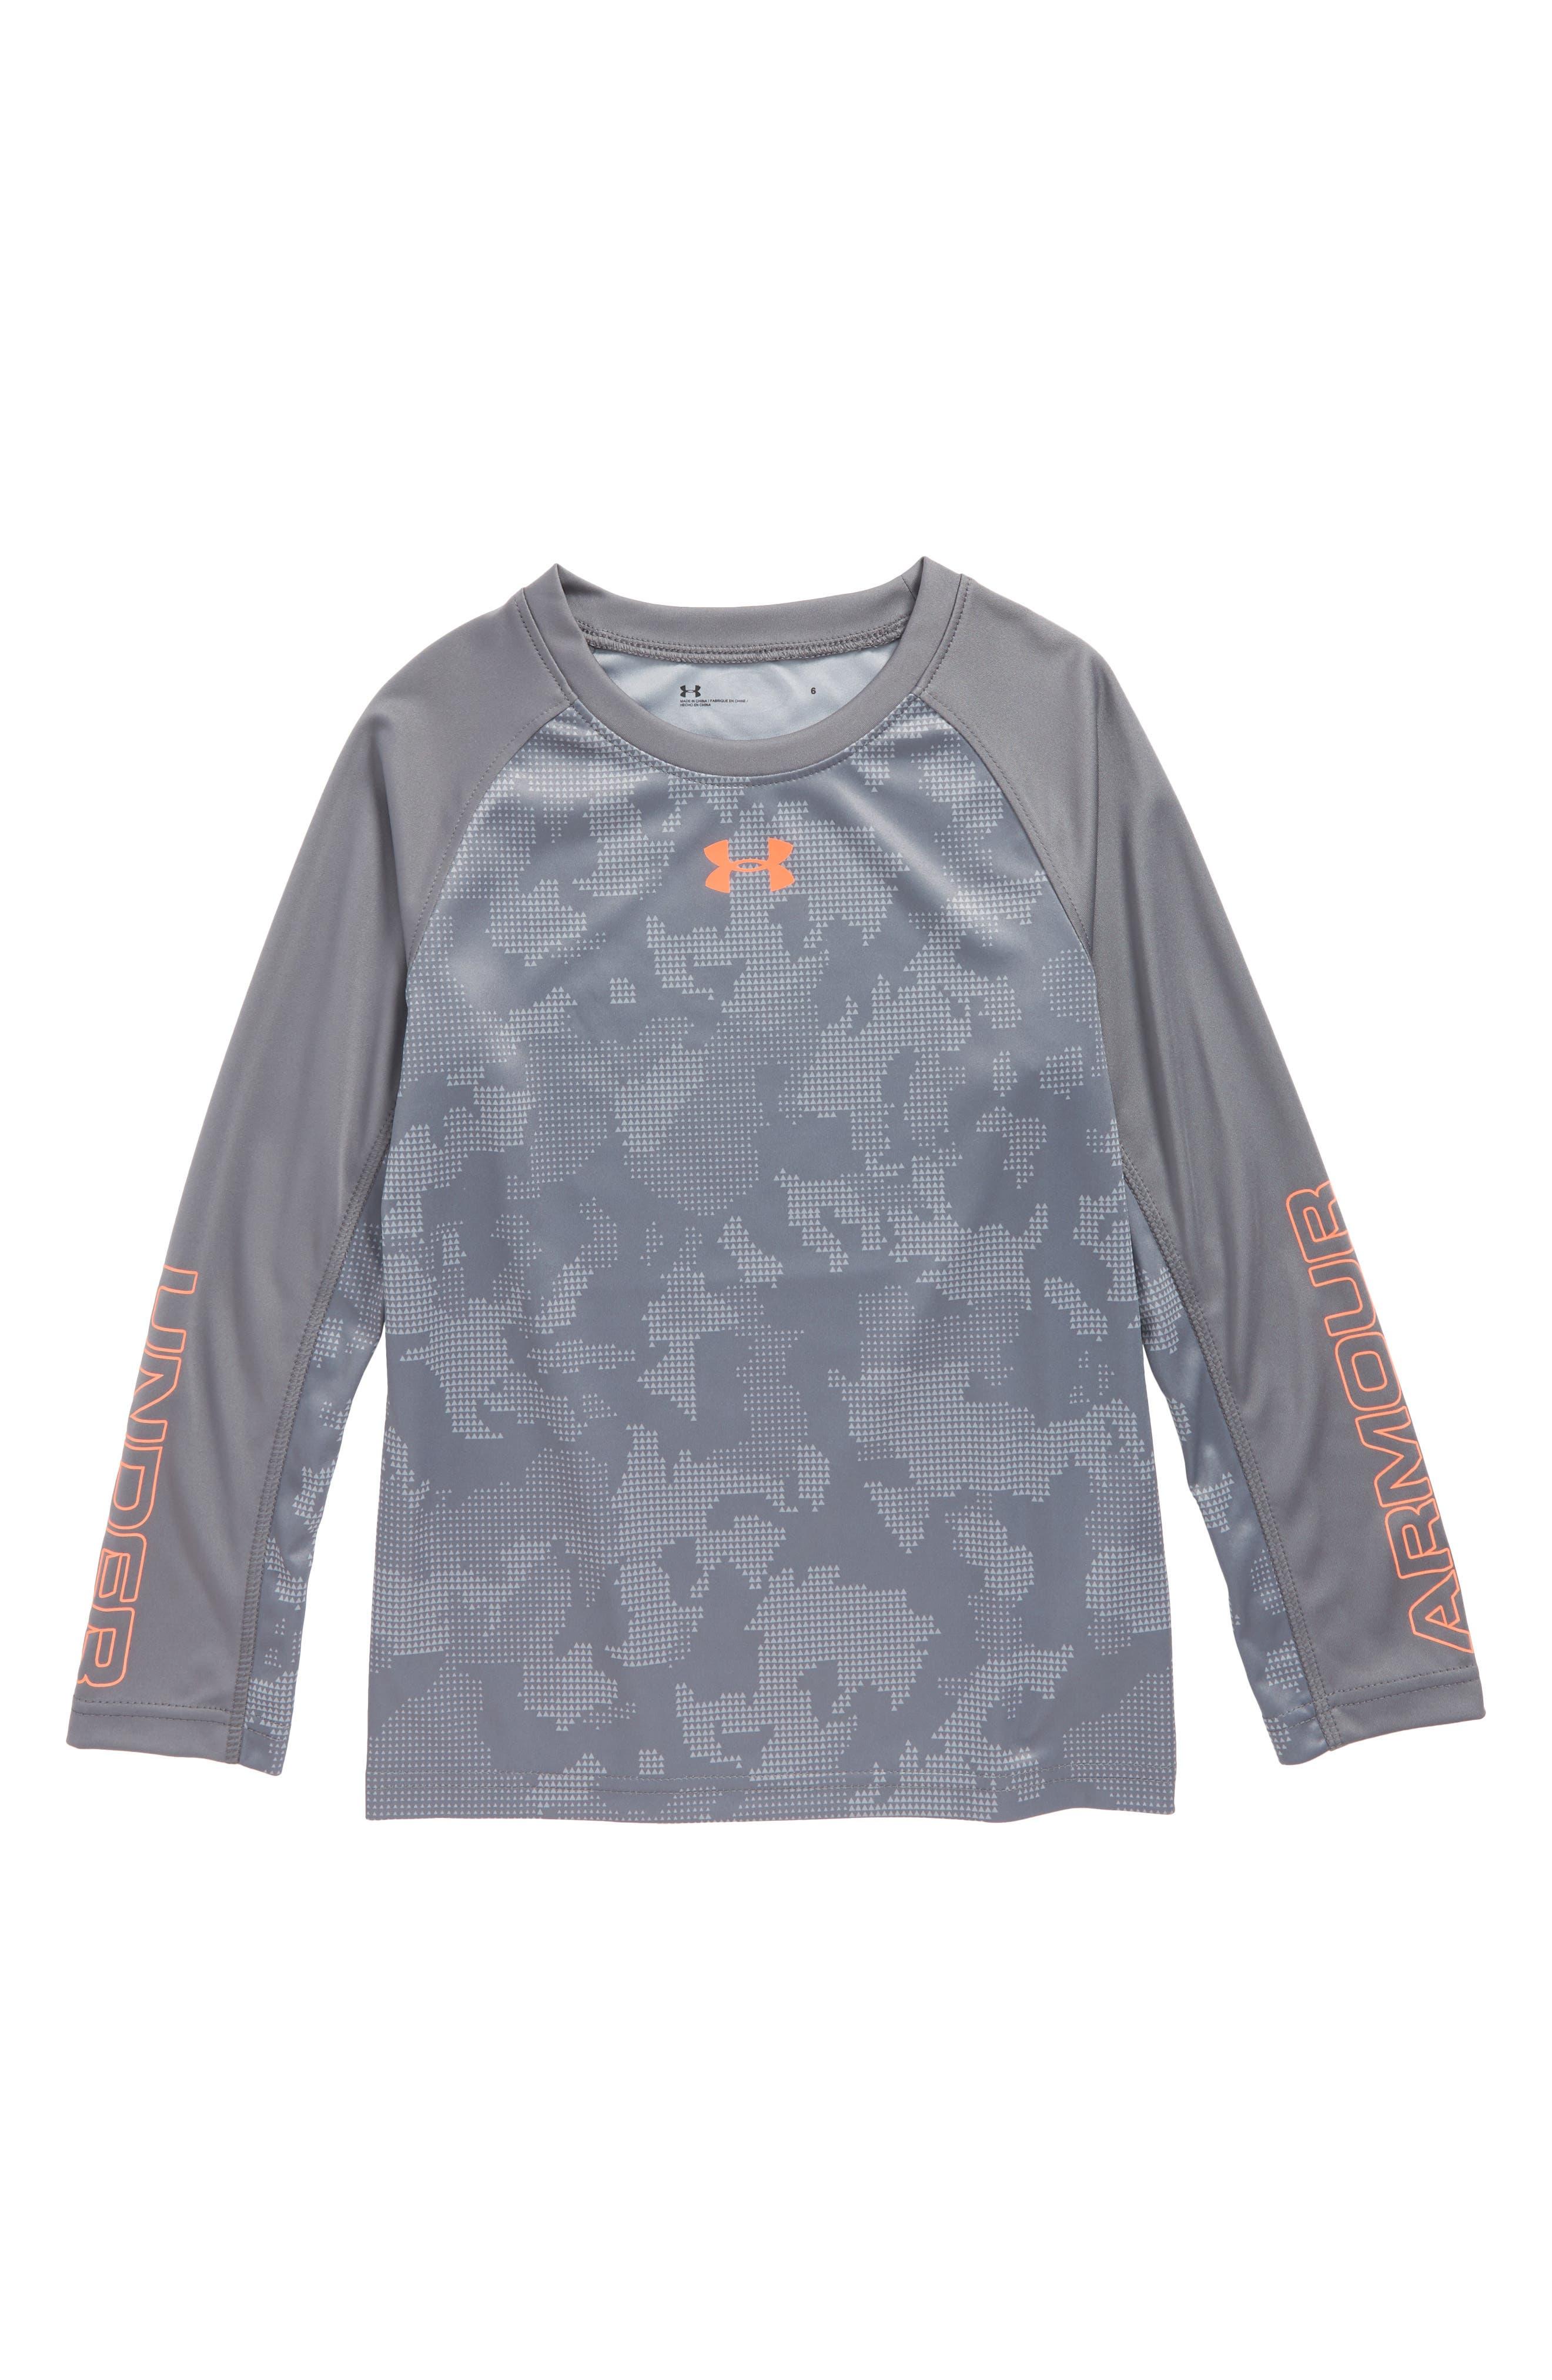 Utility Raglan Long Sleeve T-Shirt,                             Main thumbnail 1, color,                             Graphite